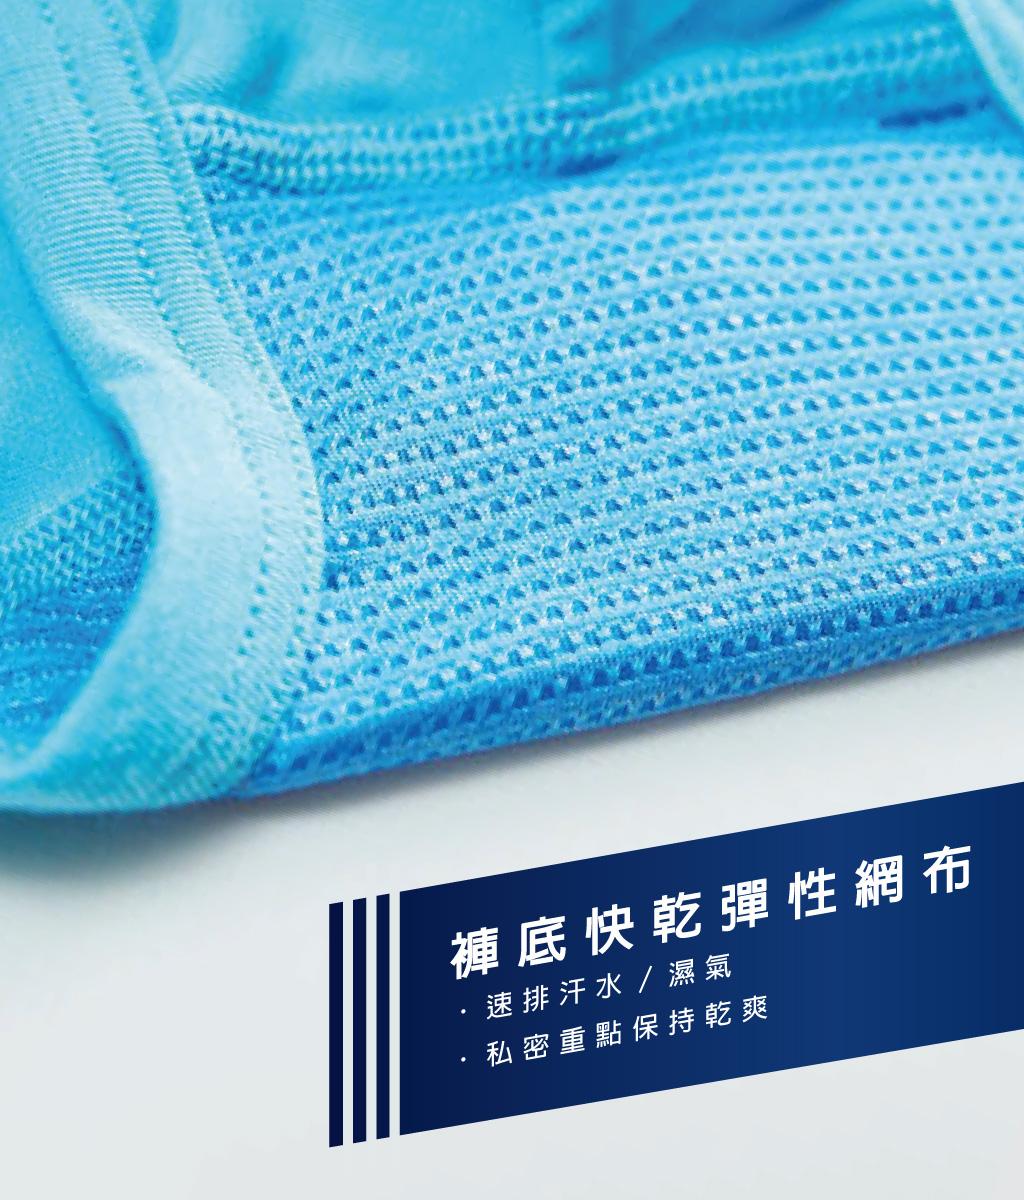 3GUN |男性時尚內衣褲MIT品牌-天翼‧能鍺AIR-透氣網眼男永效吸排三角褲